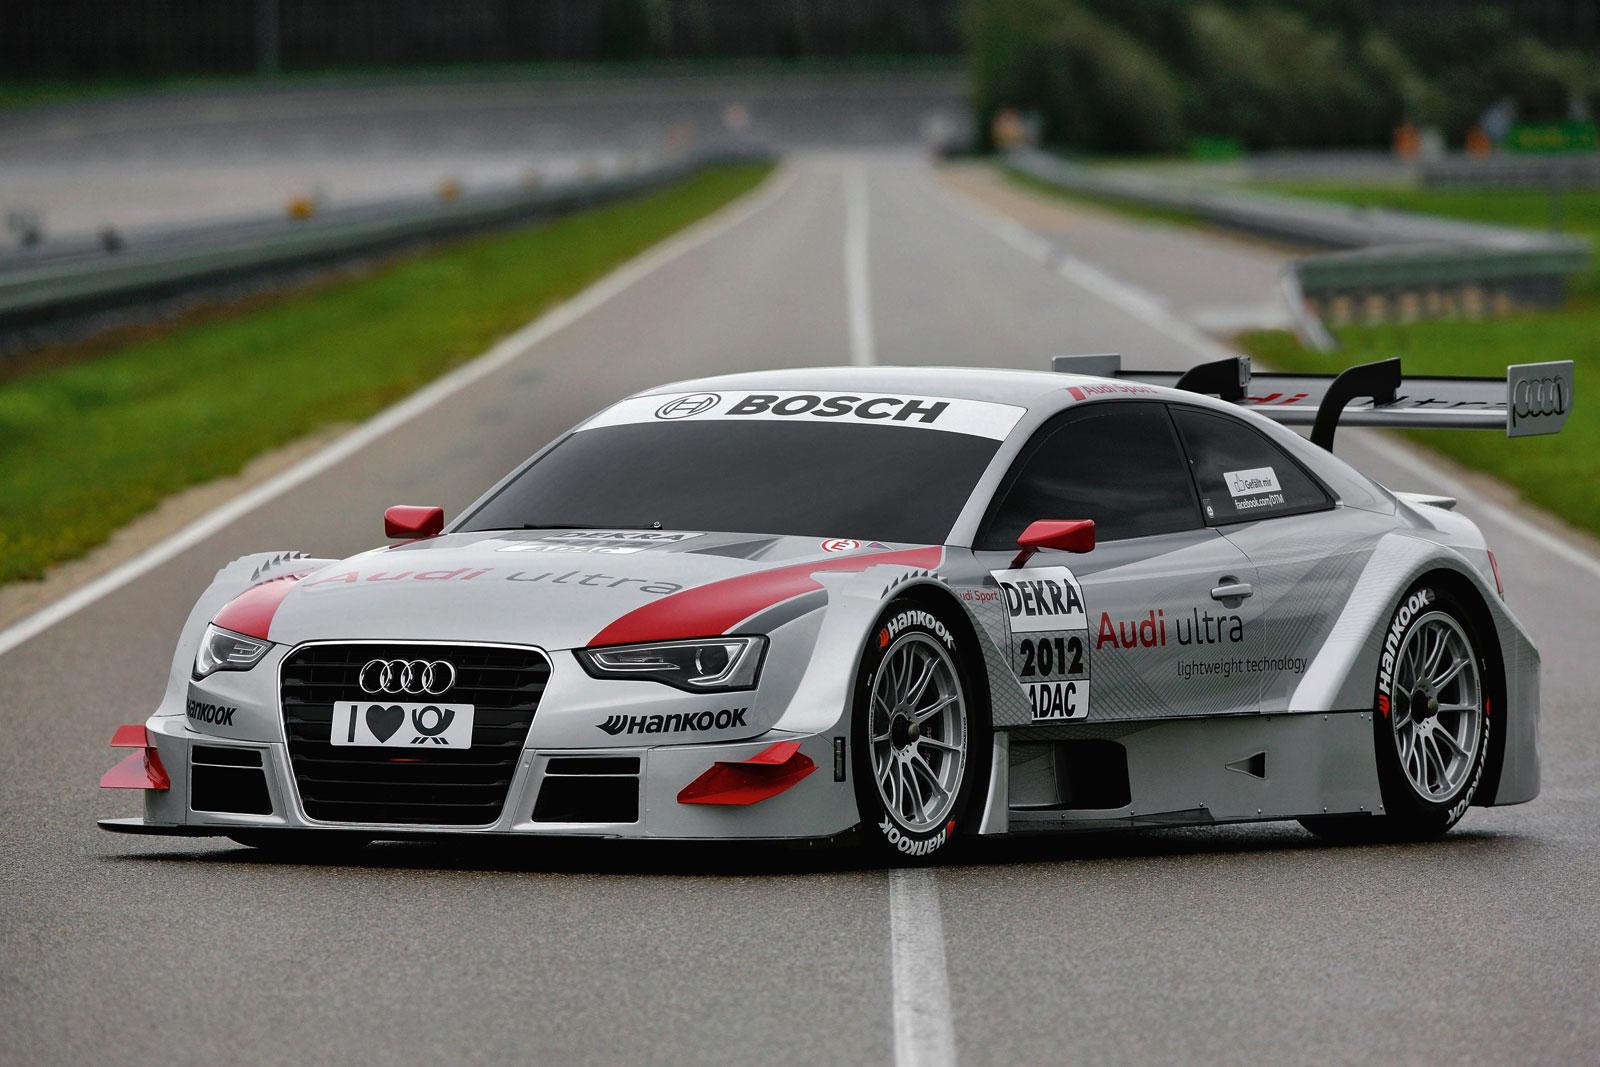 Sport Cars Audi A5 DTM Race Car hd Wallpapers 2012 1600x1067